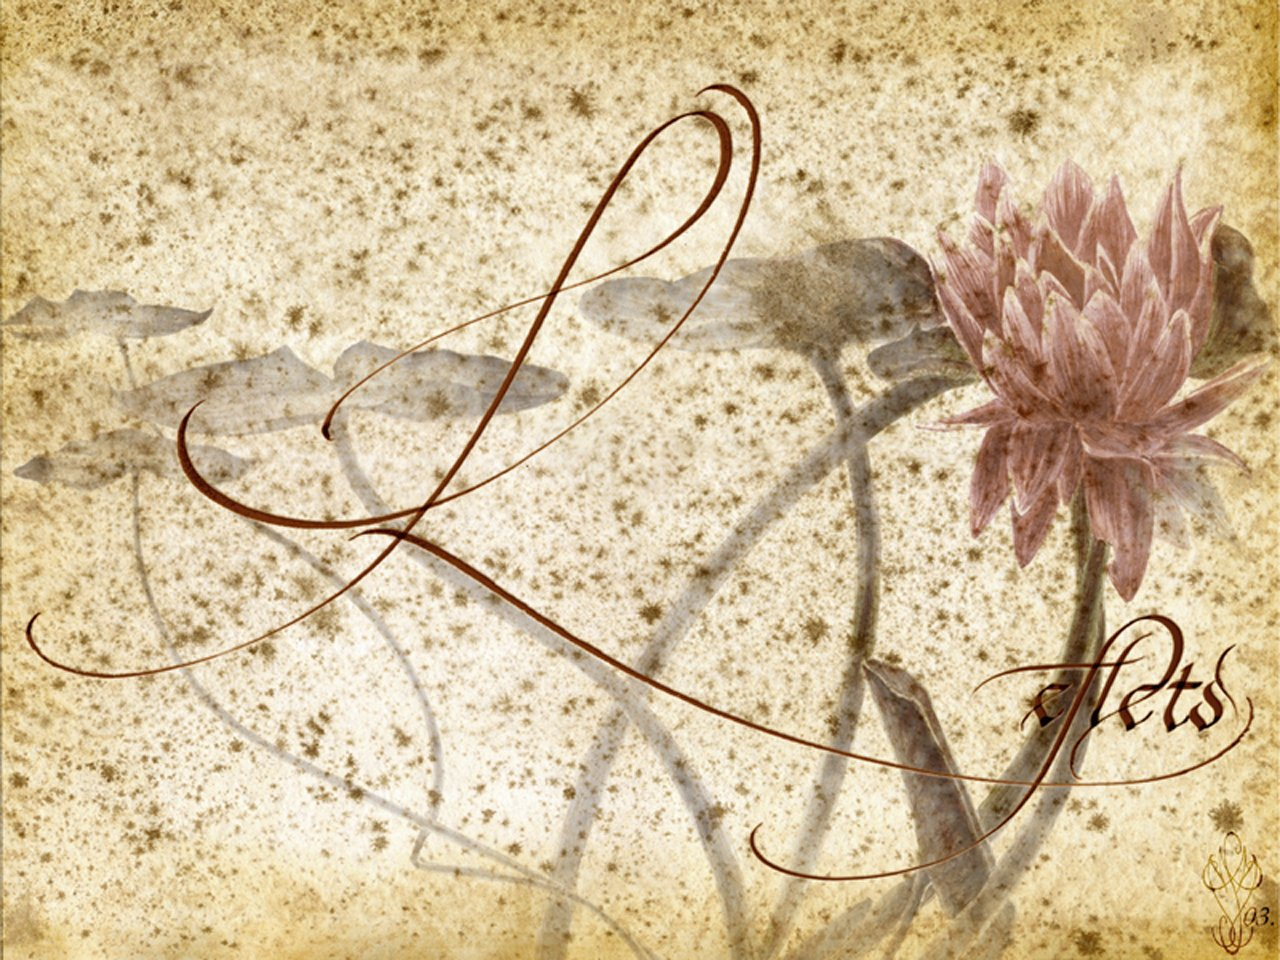 Fonds d'écran Art - Peinture Fleurs Reflets